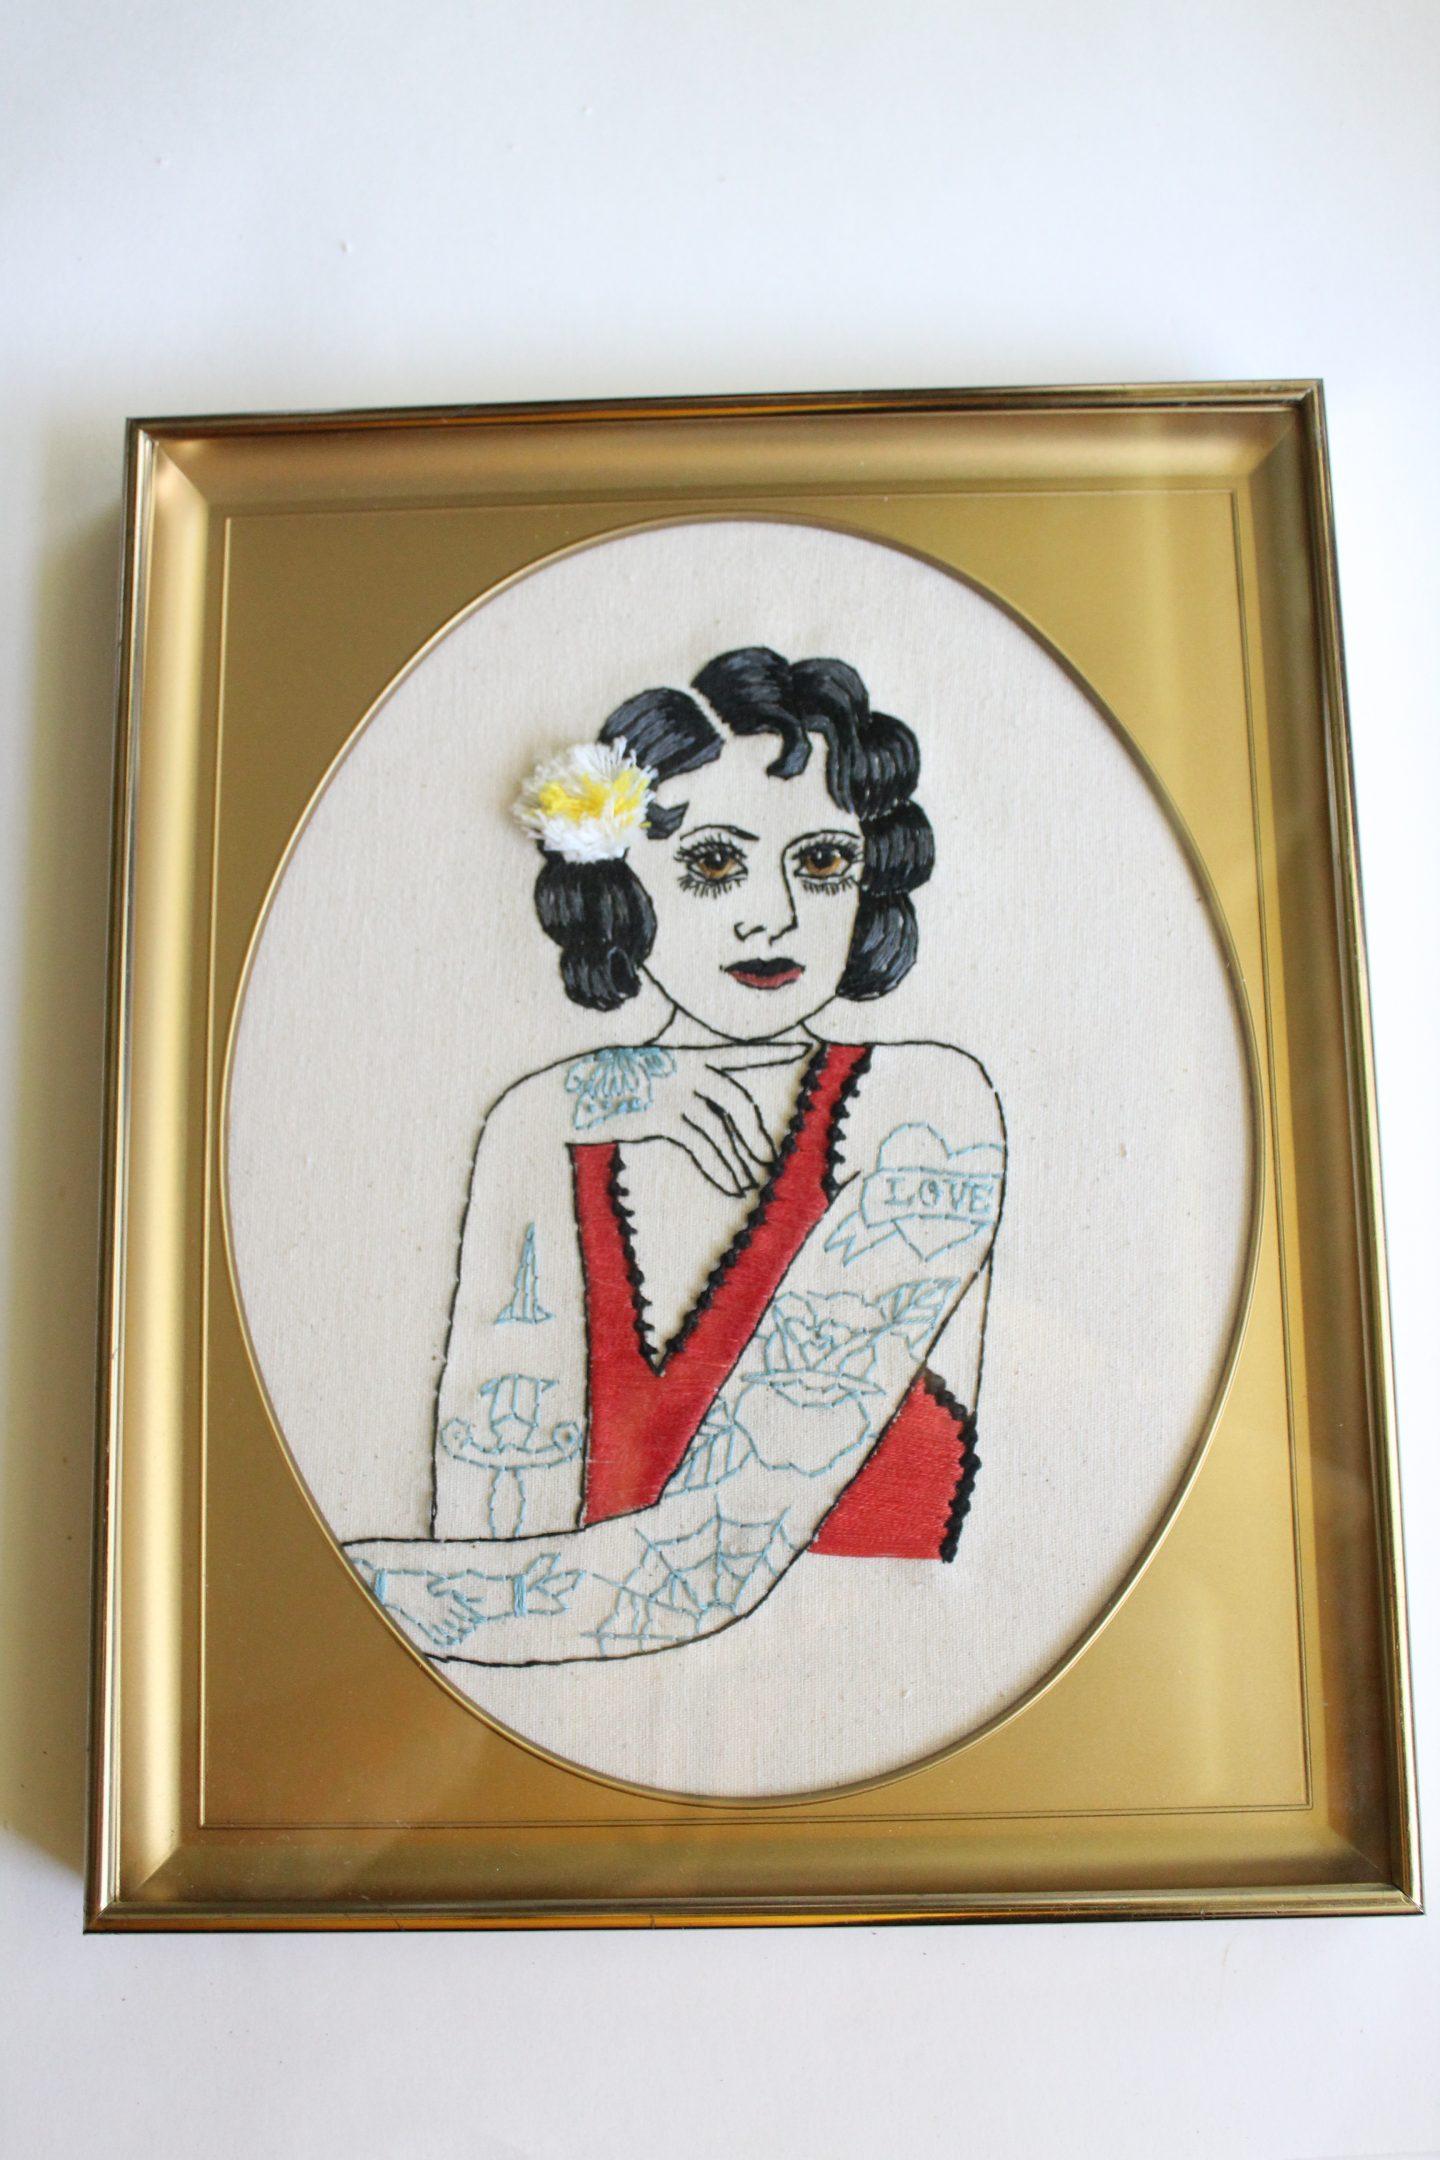 framed embroidery art